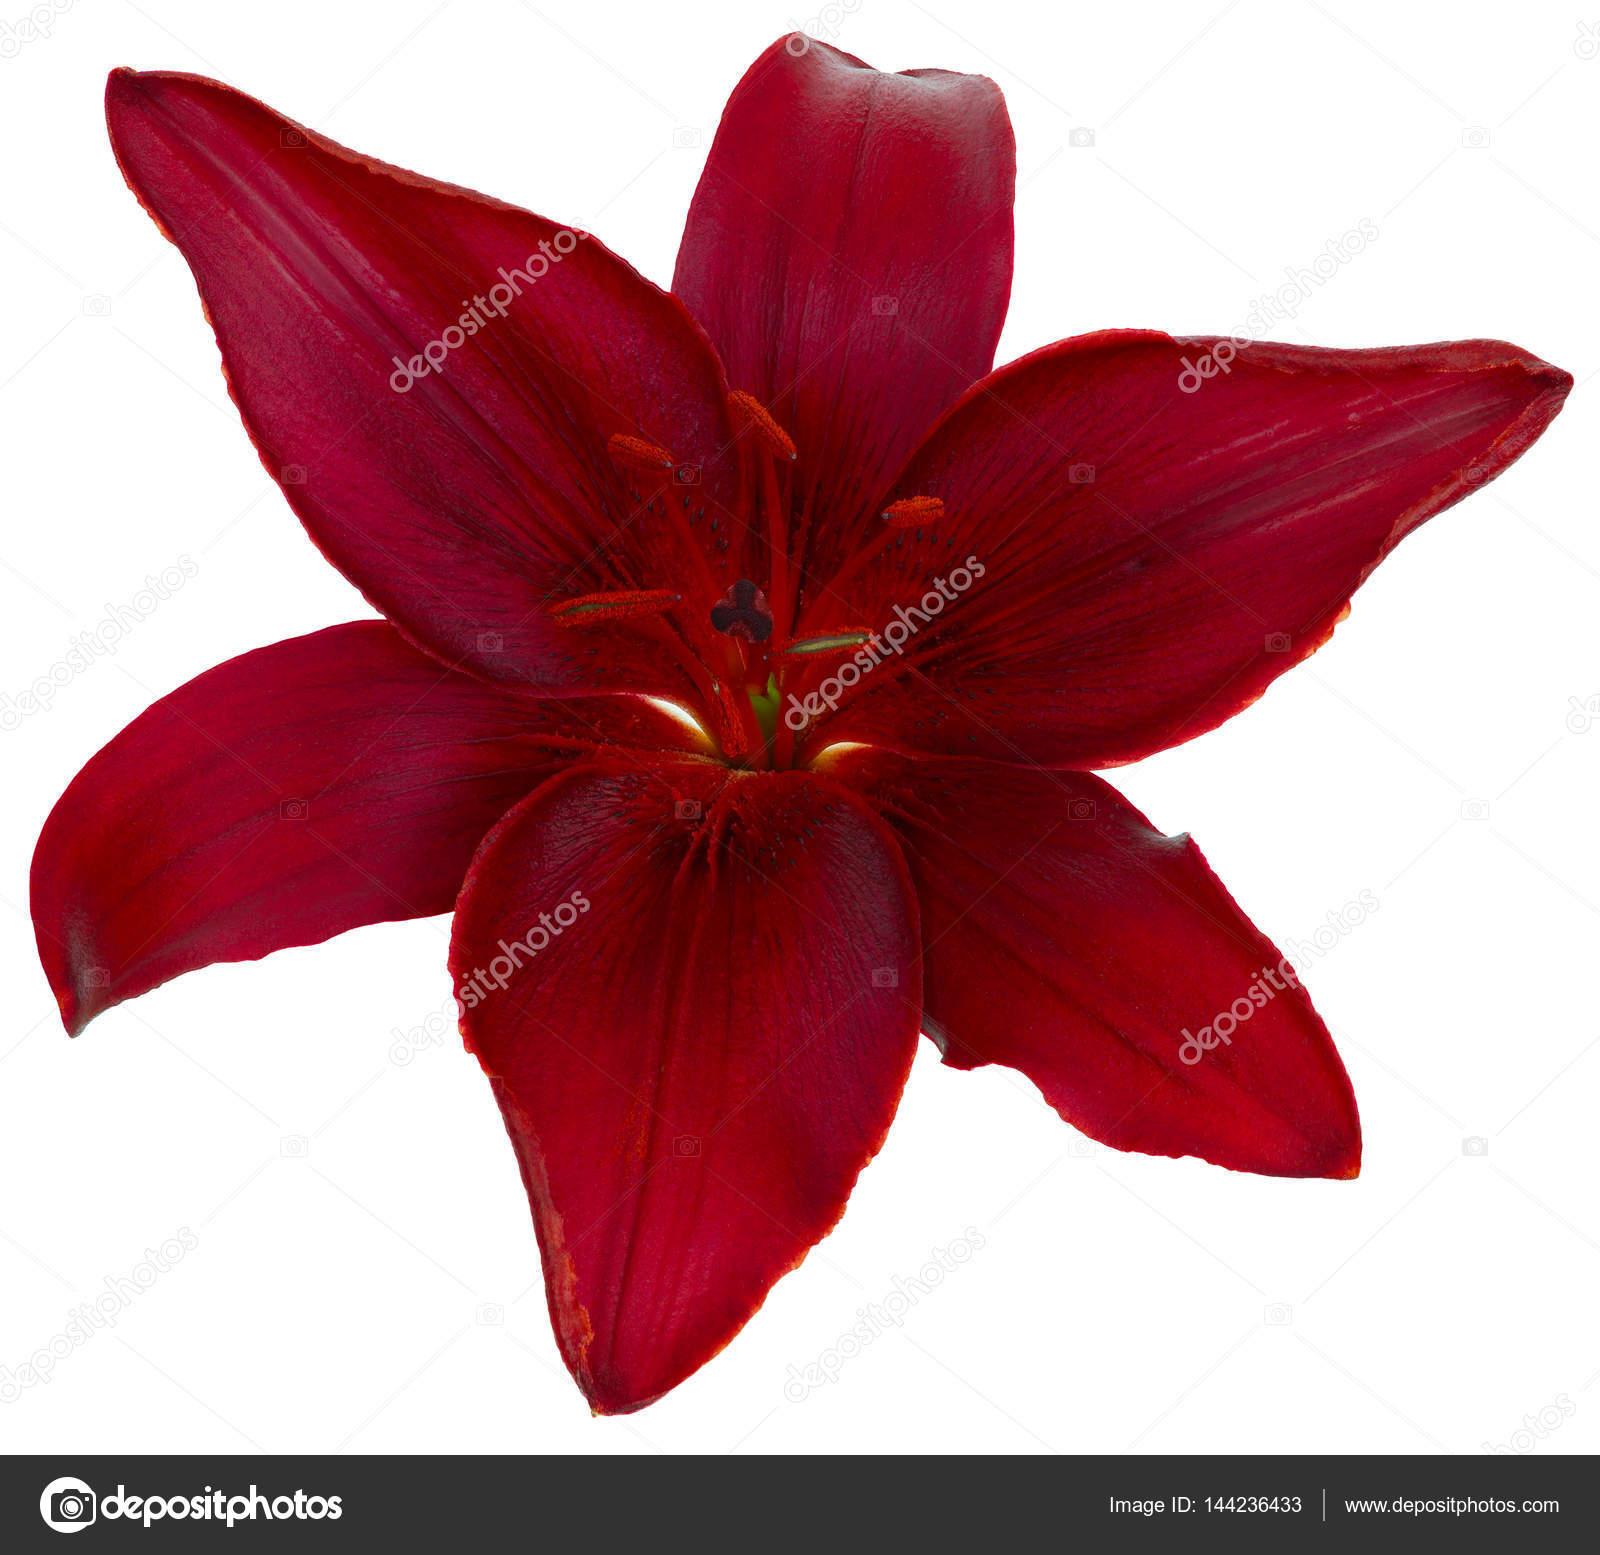 Bright red lily flower photographed close up isolated on white bright red lily flower photographed close up isolated on white background photo by olgapkurguzova izmirmasajfo